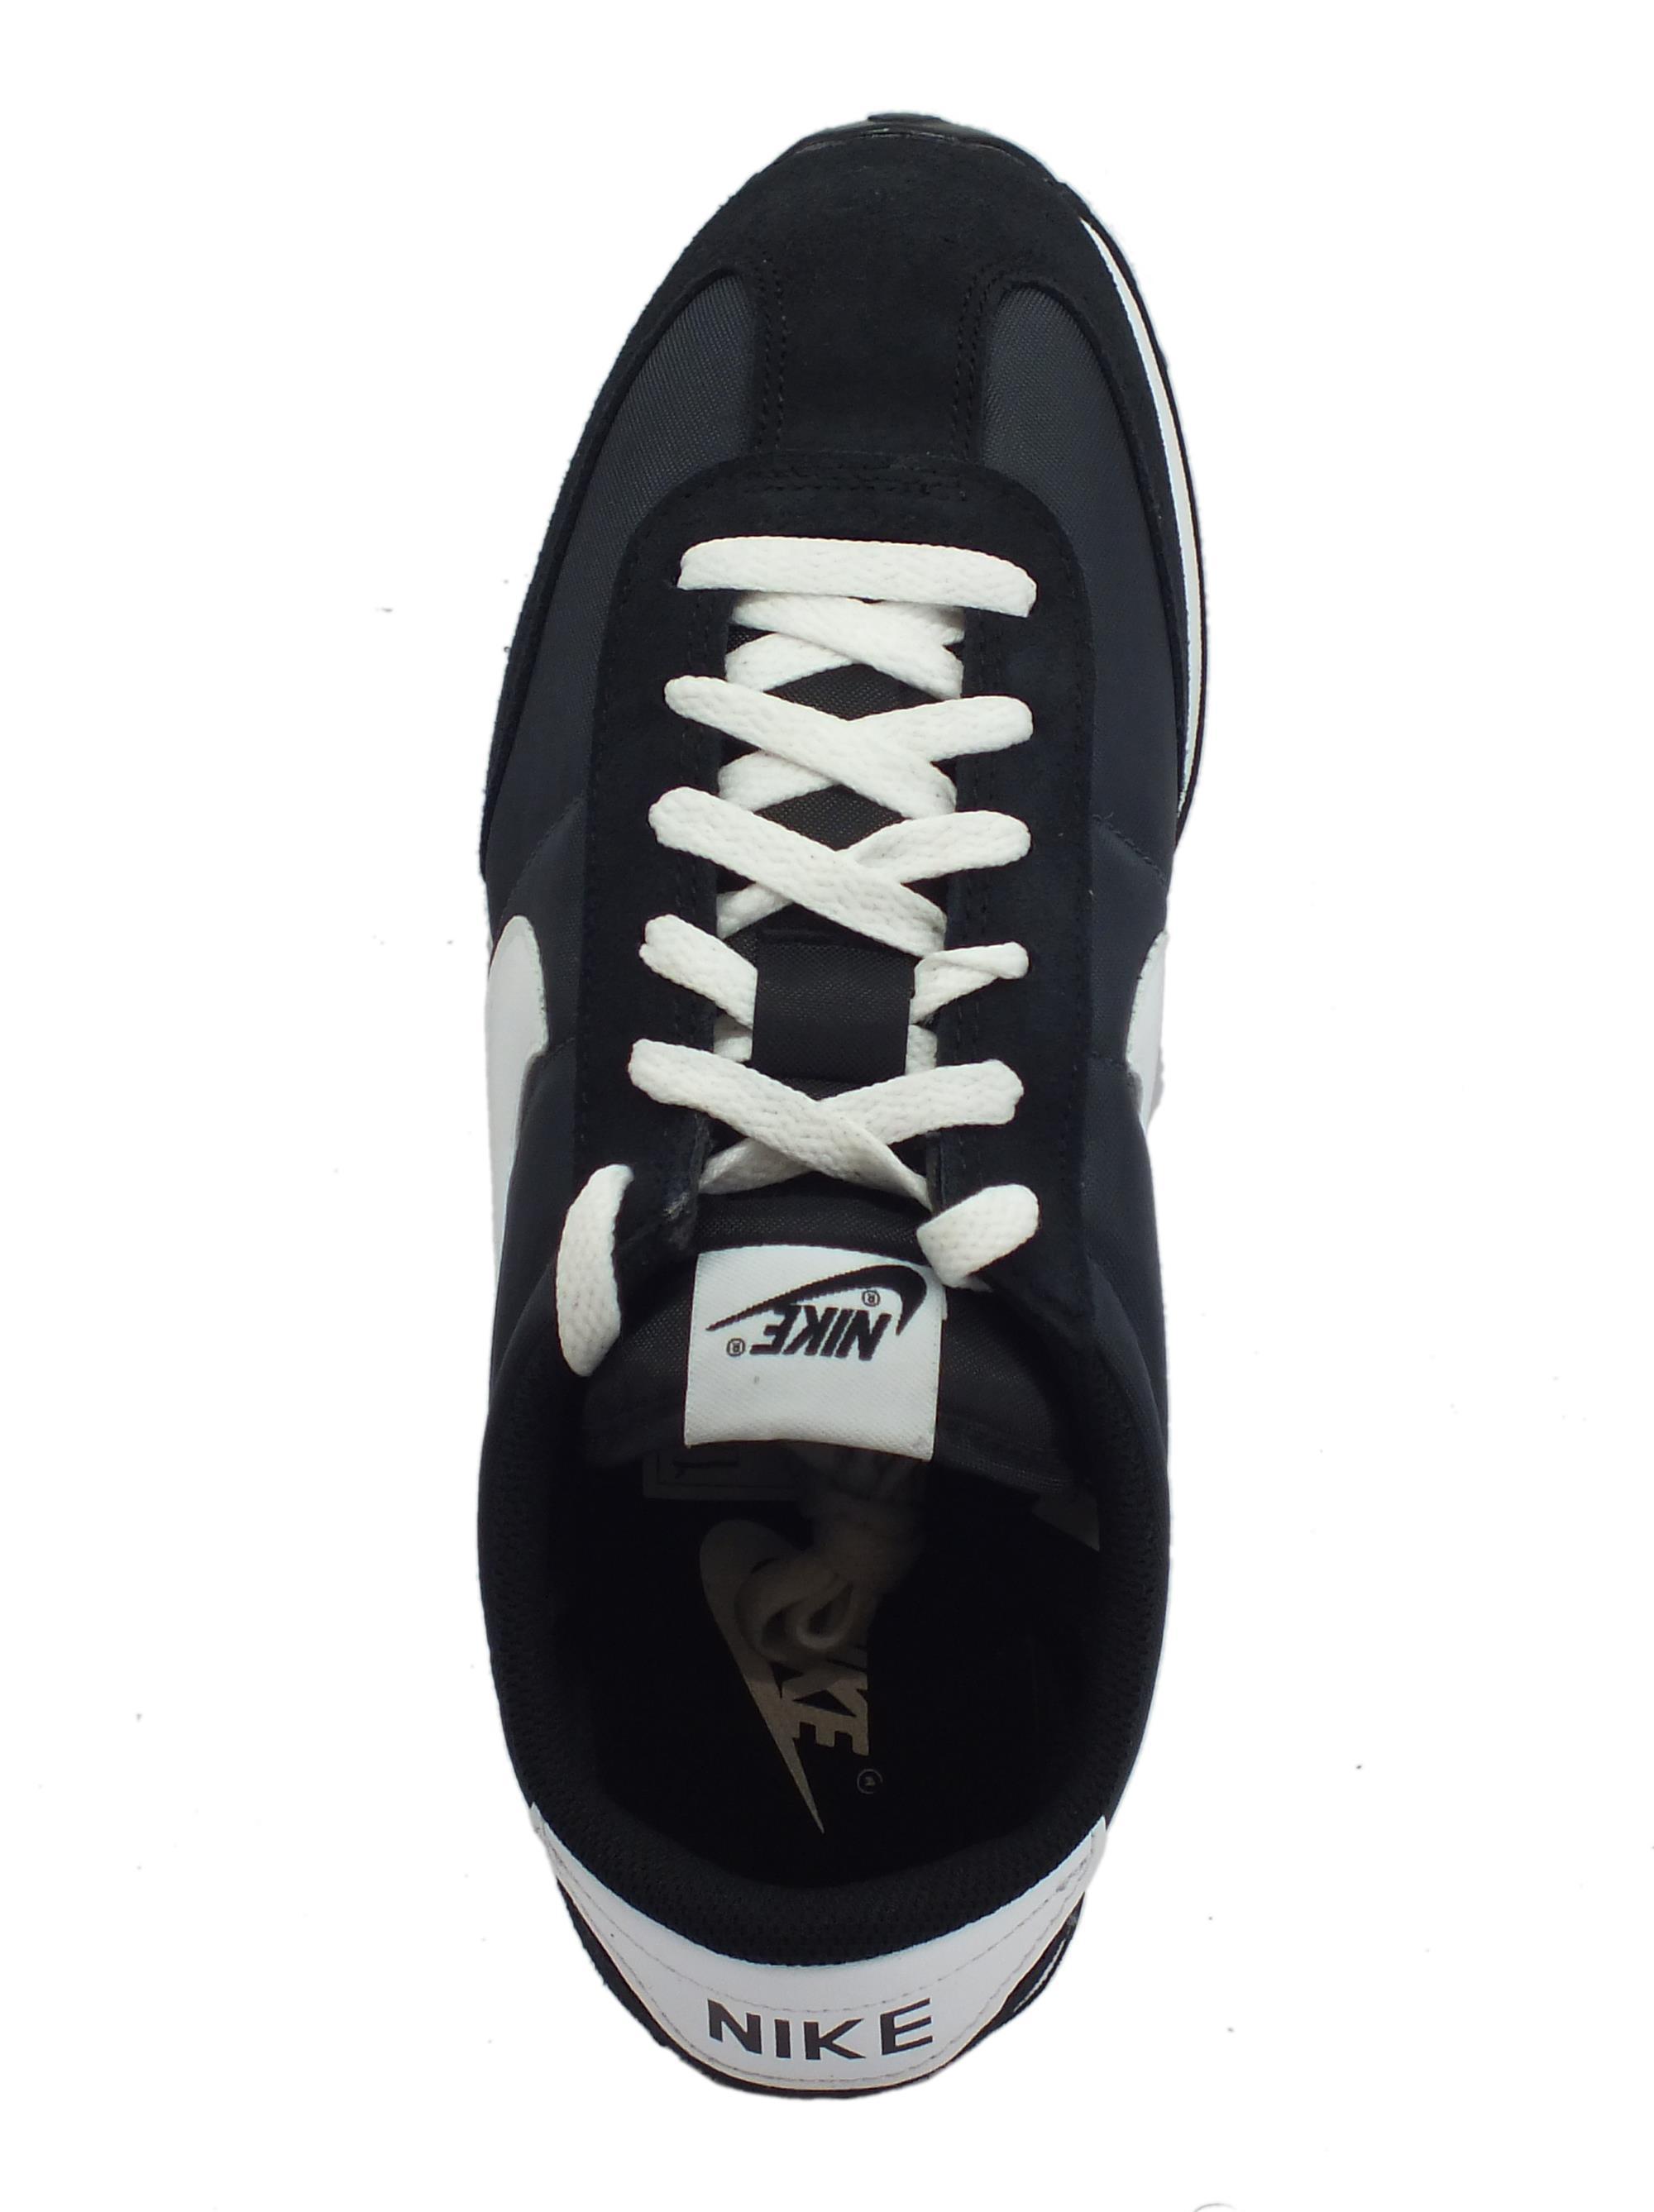 ... Scarpe sportive per uomo Nike mach runner camoscio e tessuto nero afacf6f1bd1